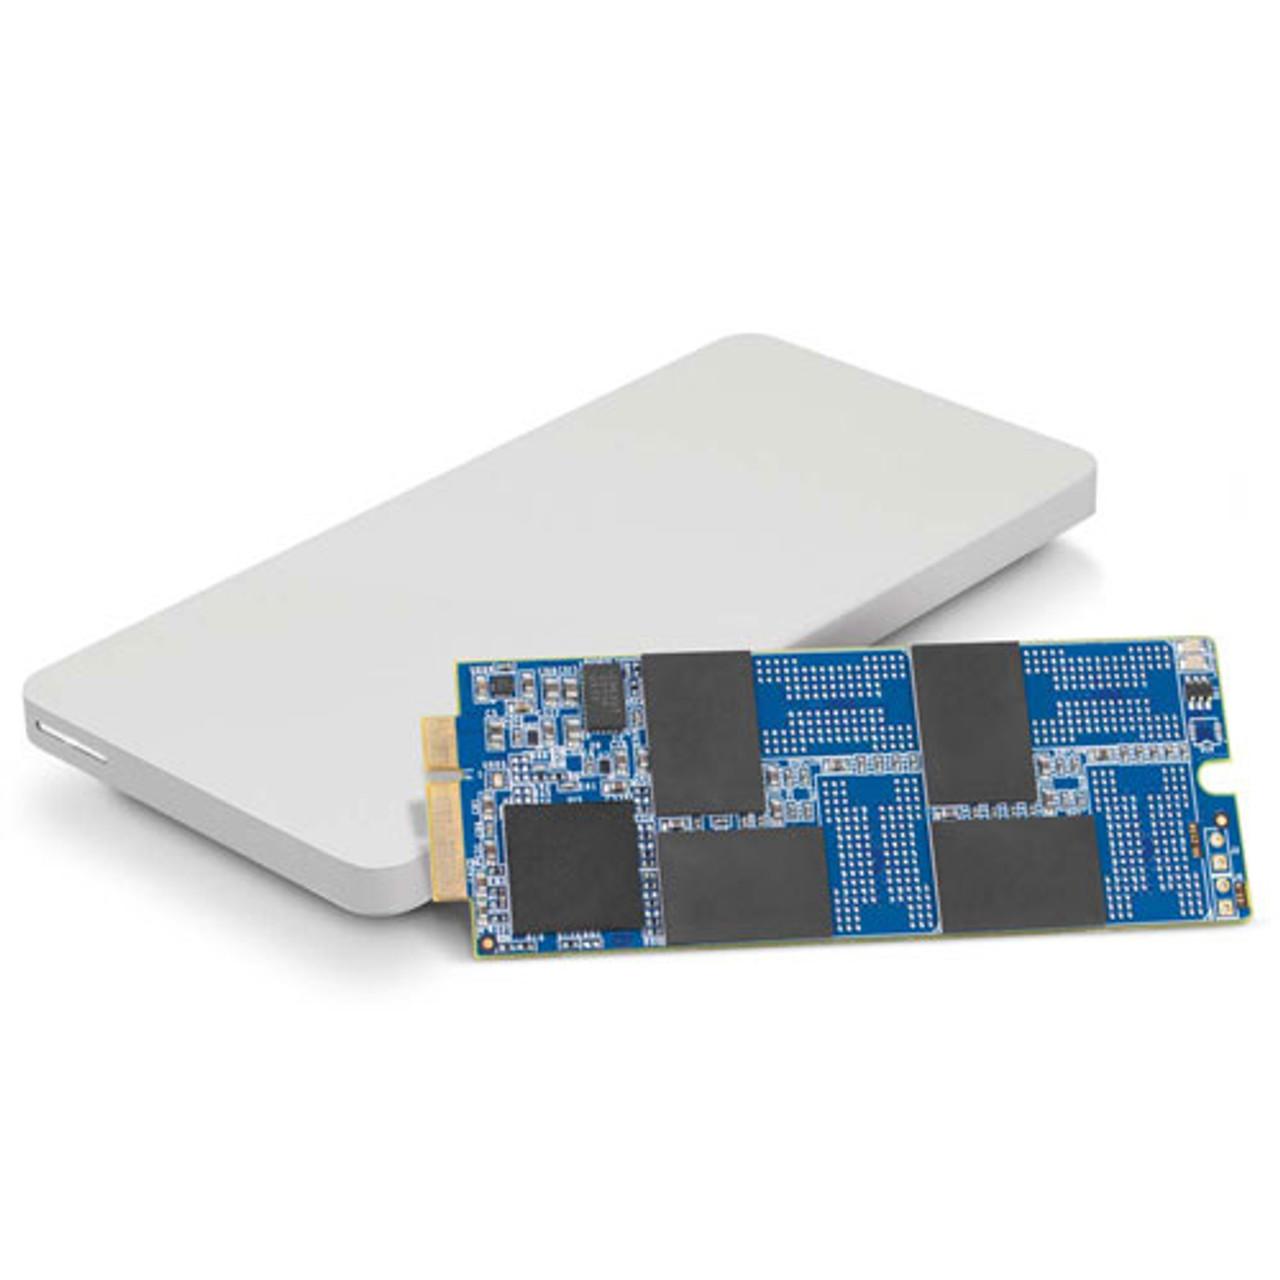 OWCS3DAP12KT01, OWC 1TB Aura Pro 6G Solid-State Drive